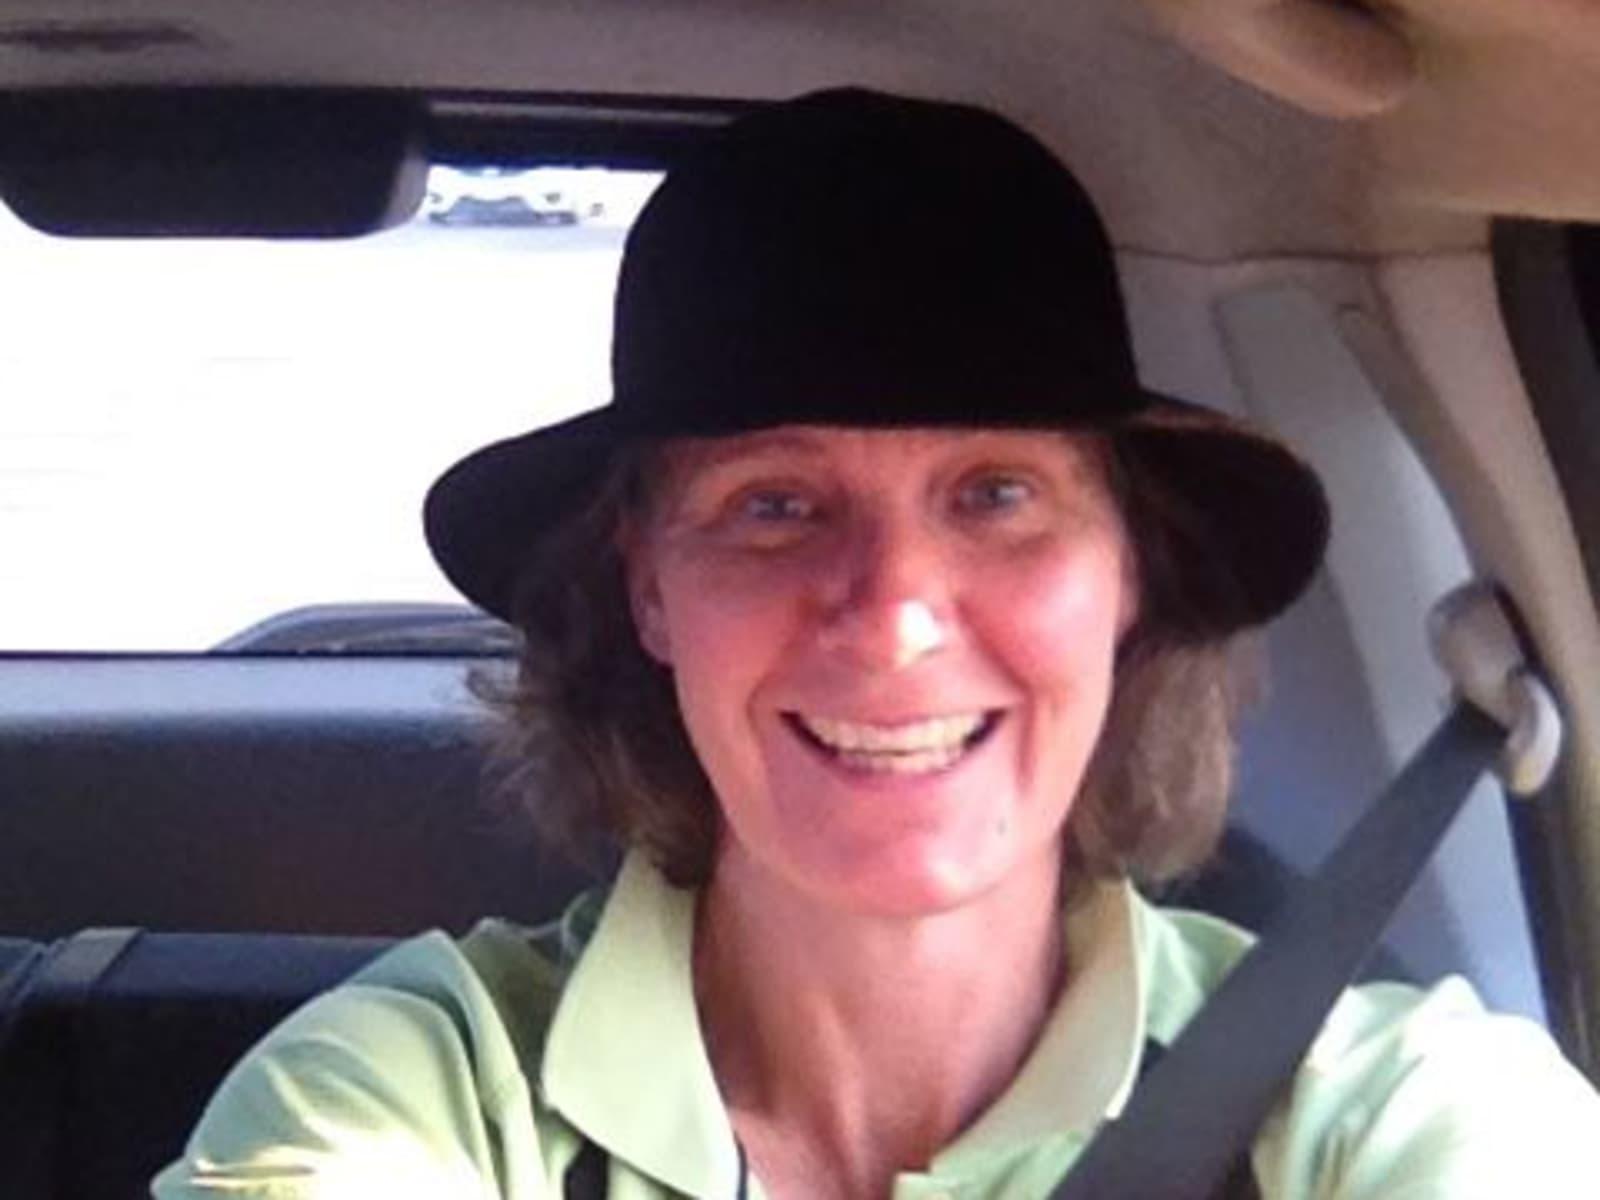 Maureen from Canberra, Australian Capital Territory, Australia